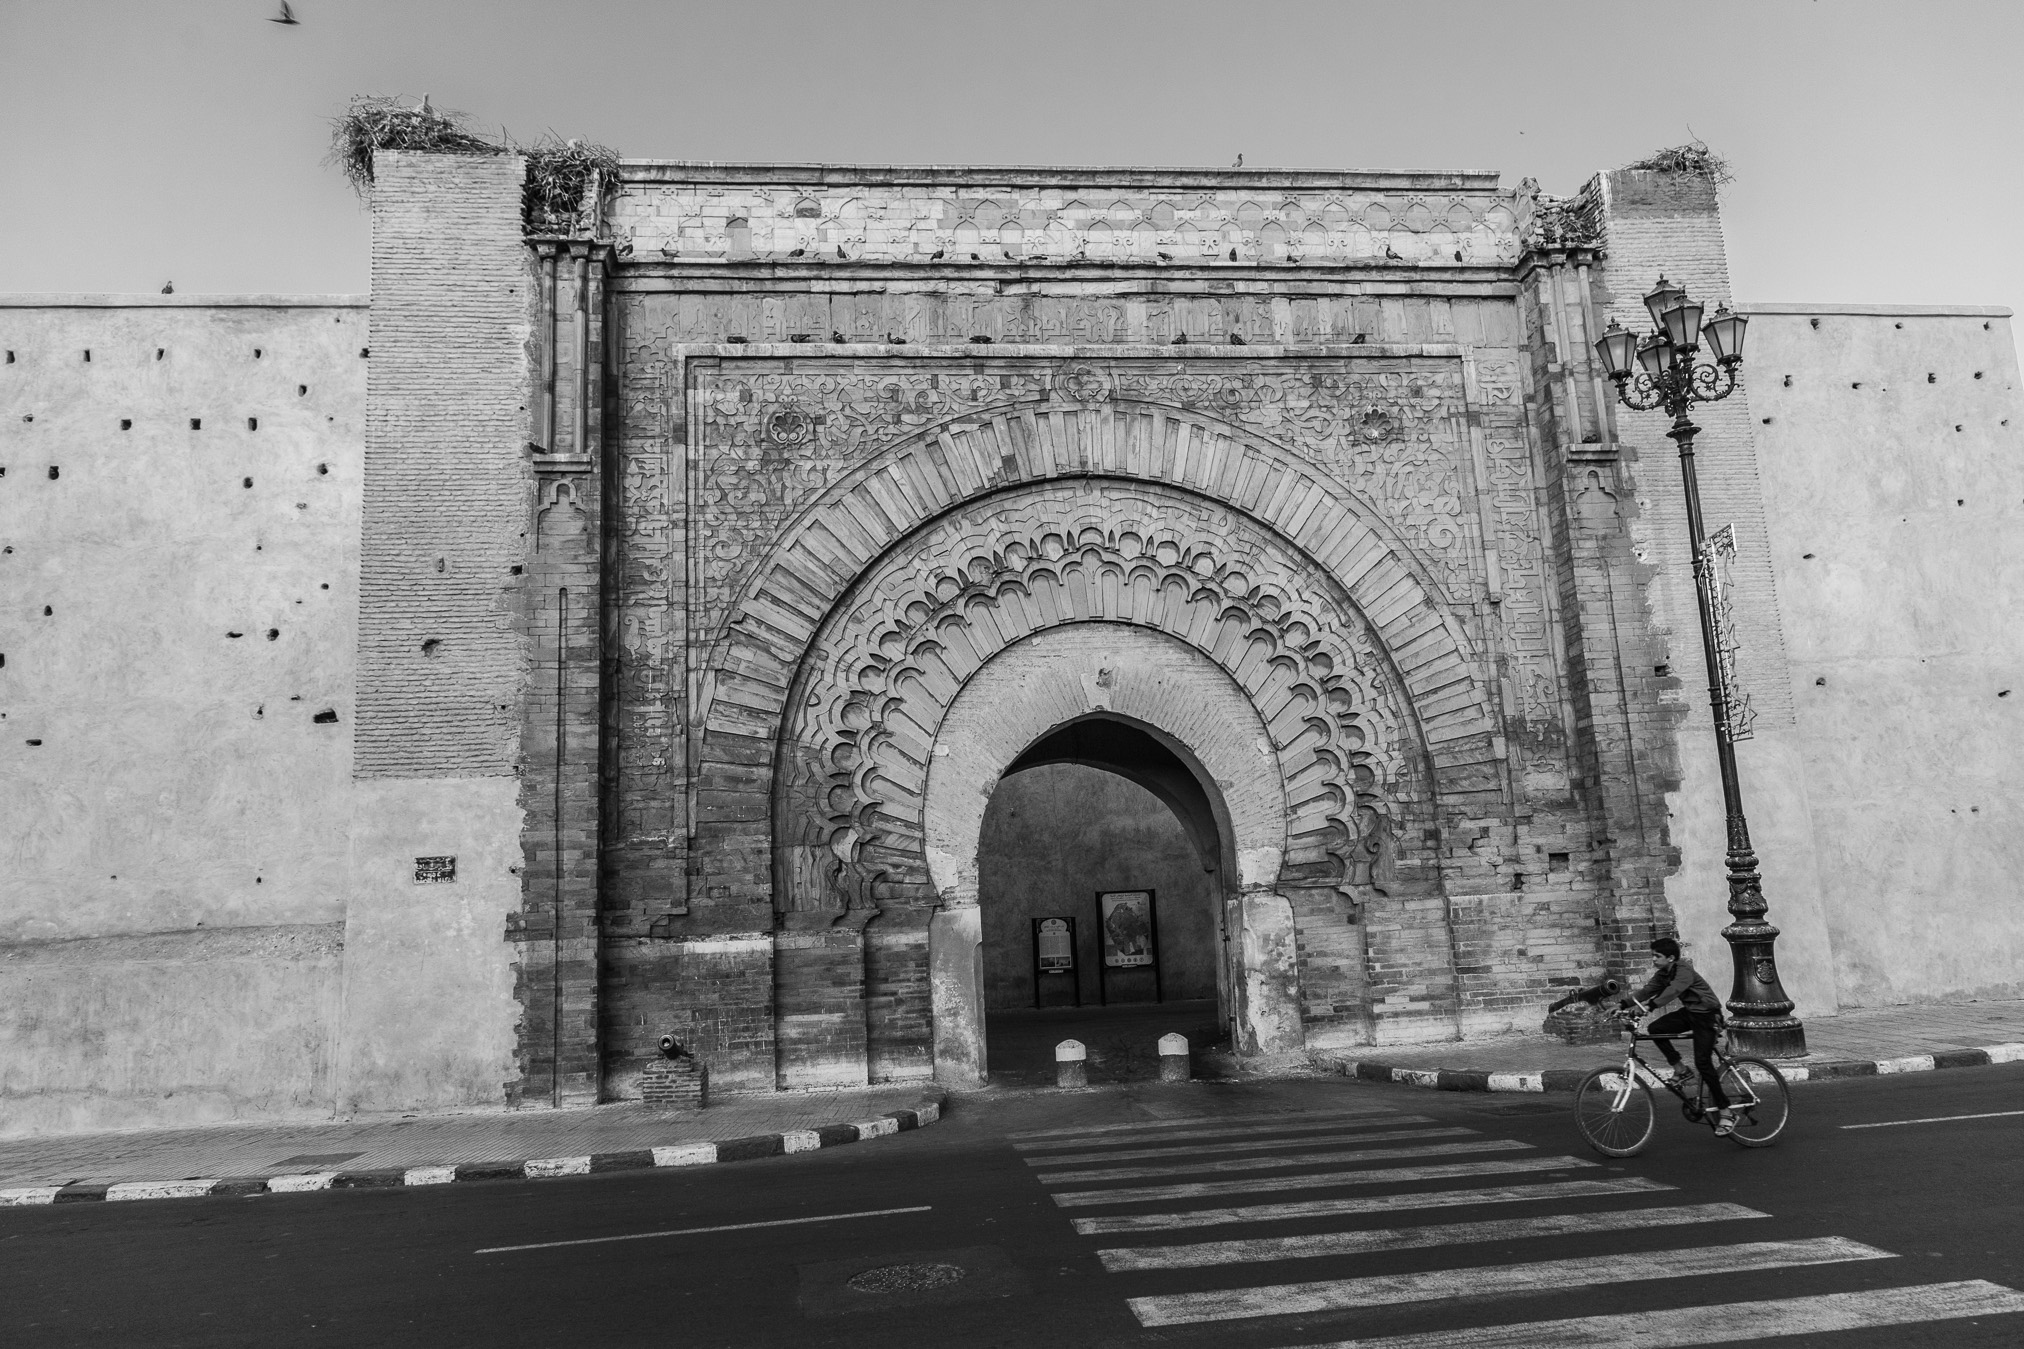 Puerta de Marrakech